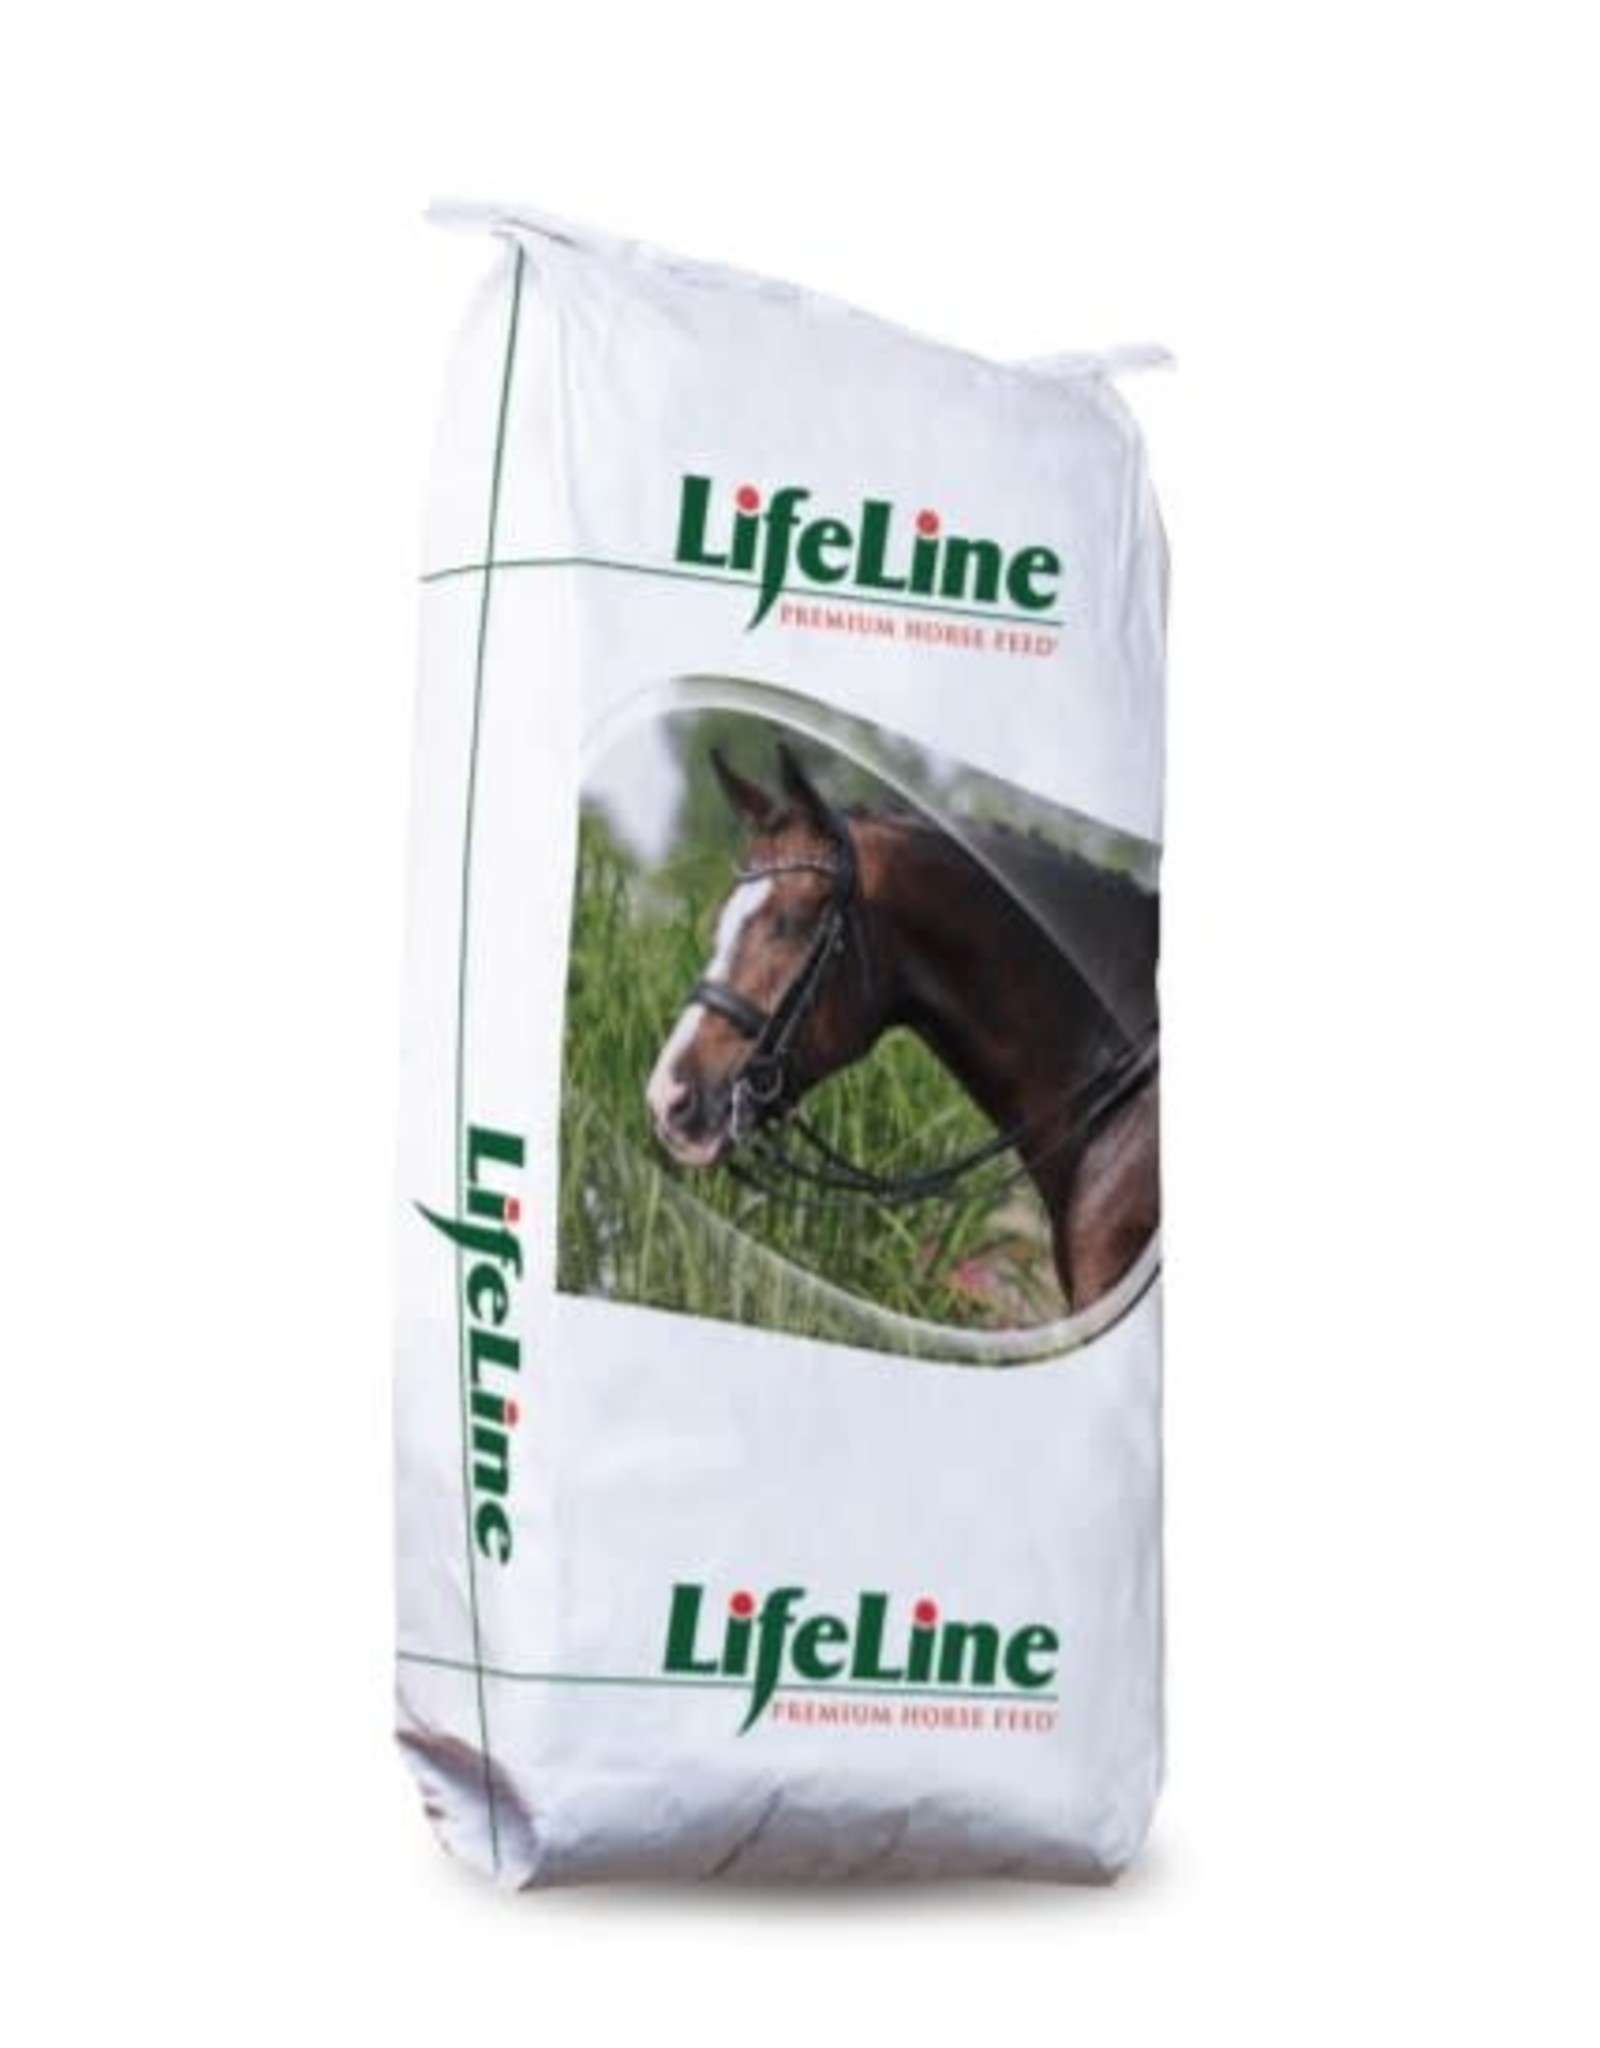 Lifeline Lifeline Classic Care 20KG